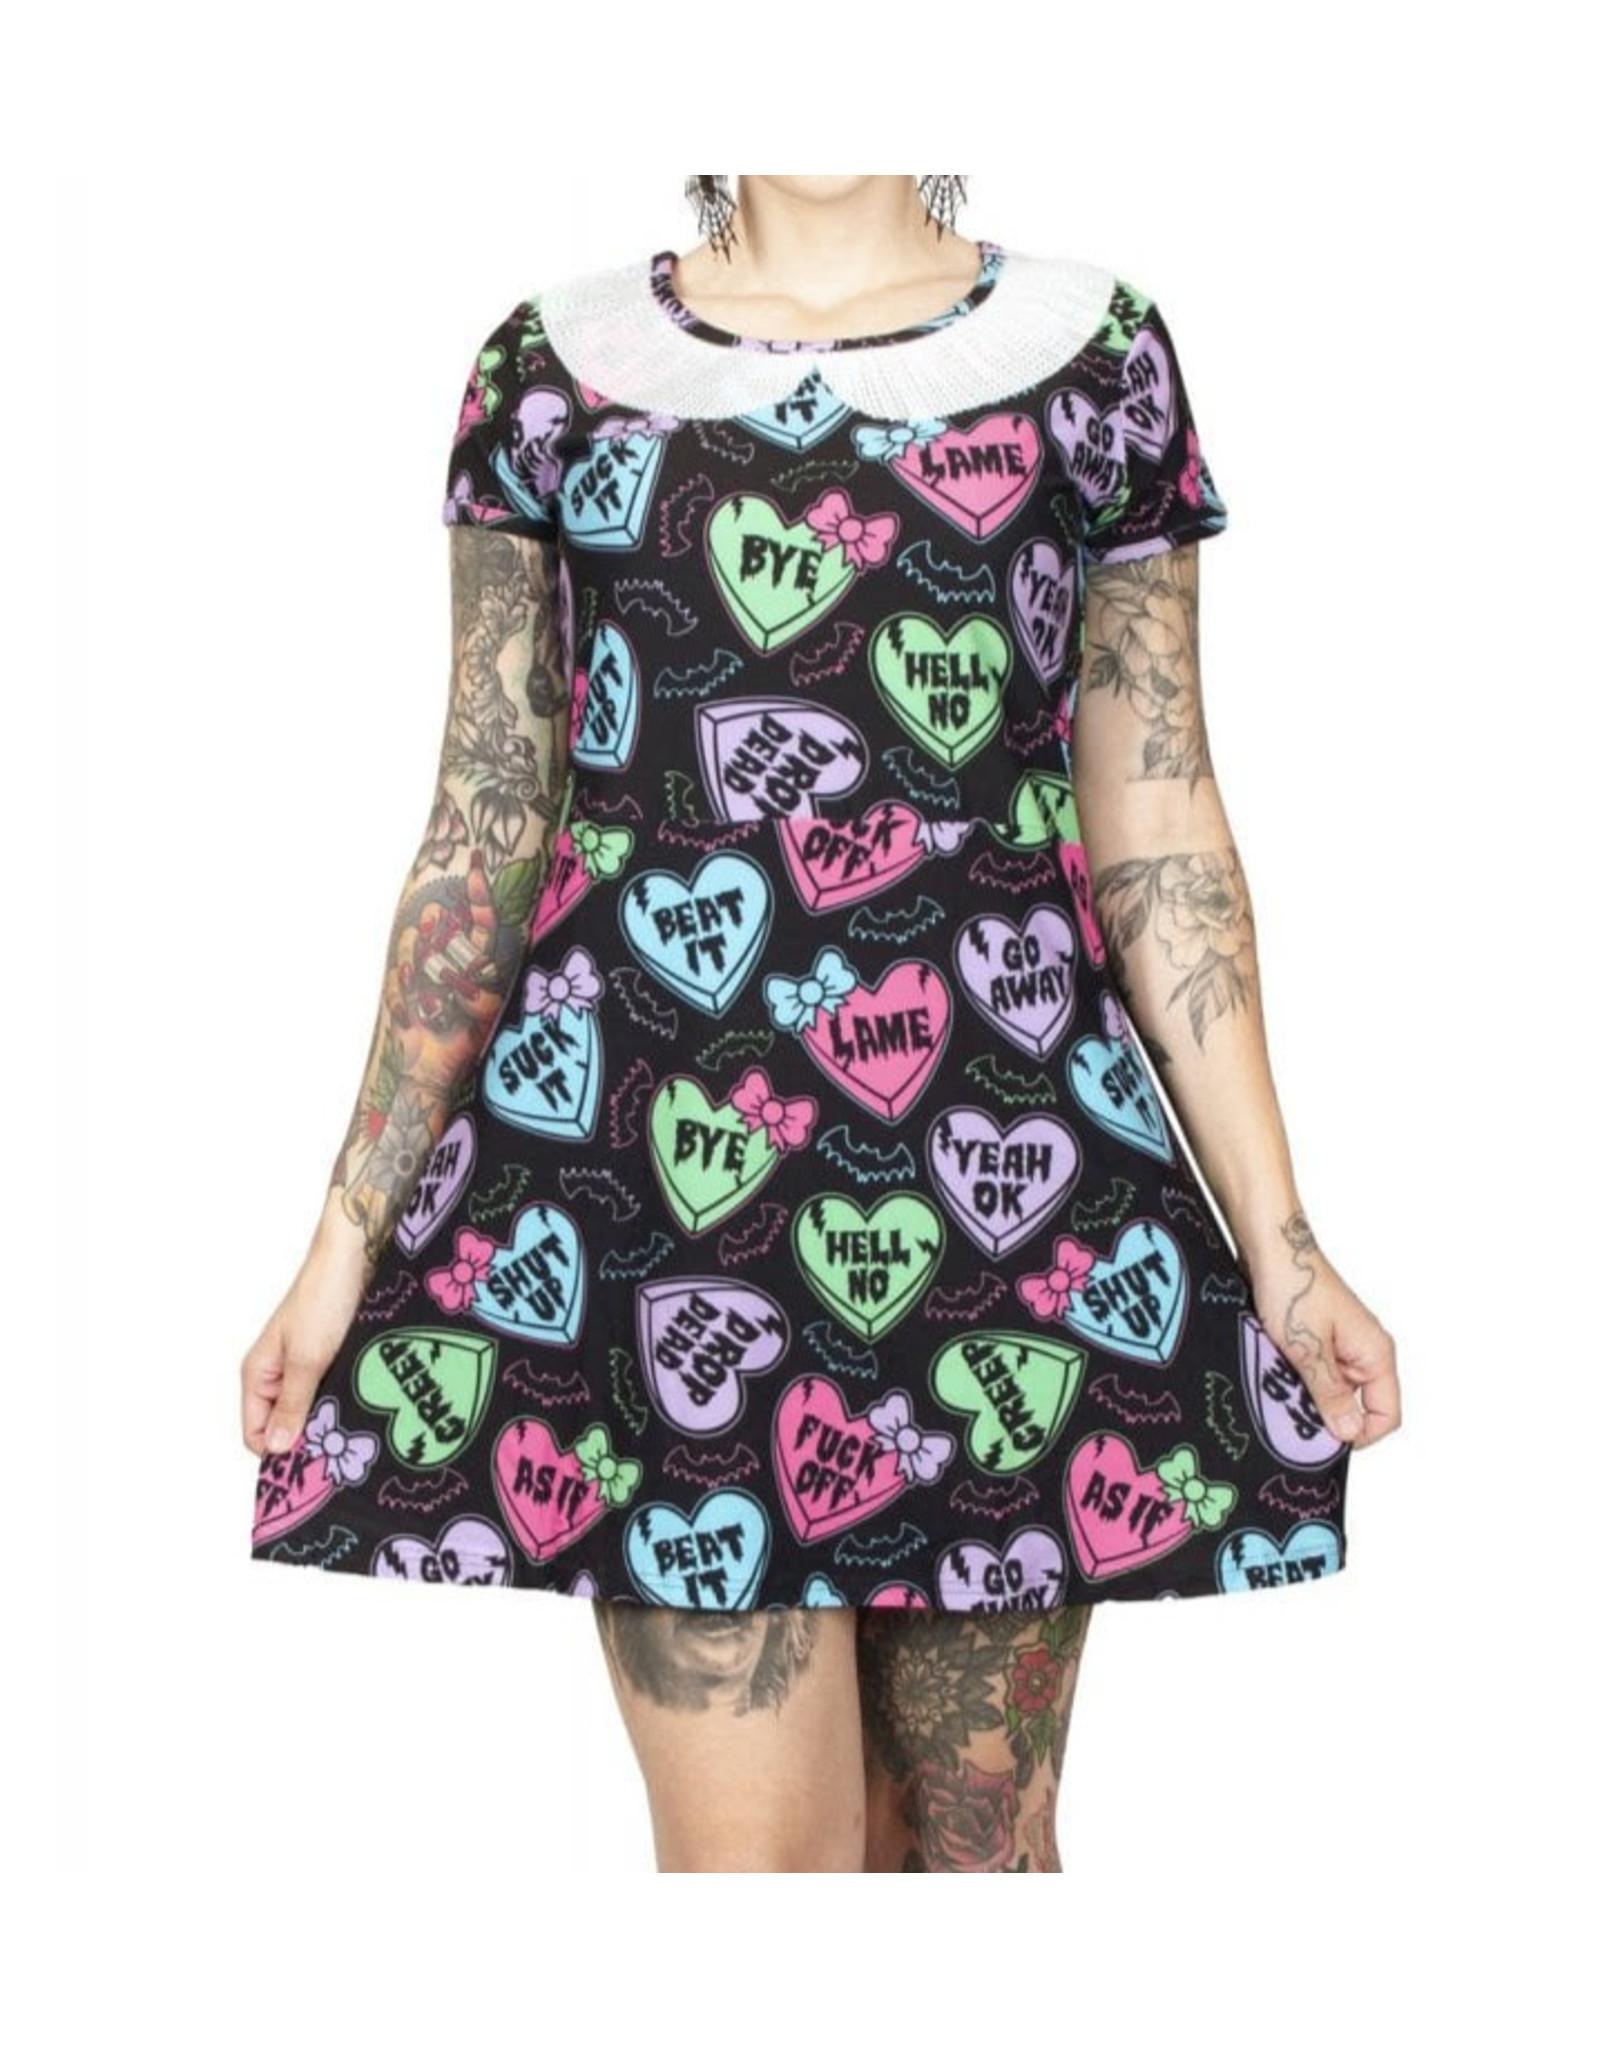 TOO FAST - Creepy Candy Heart A-Line Collar Mini Dress